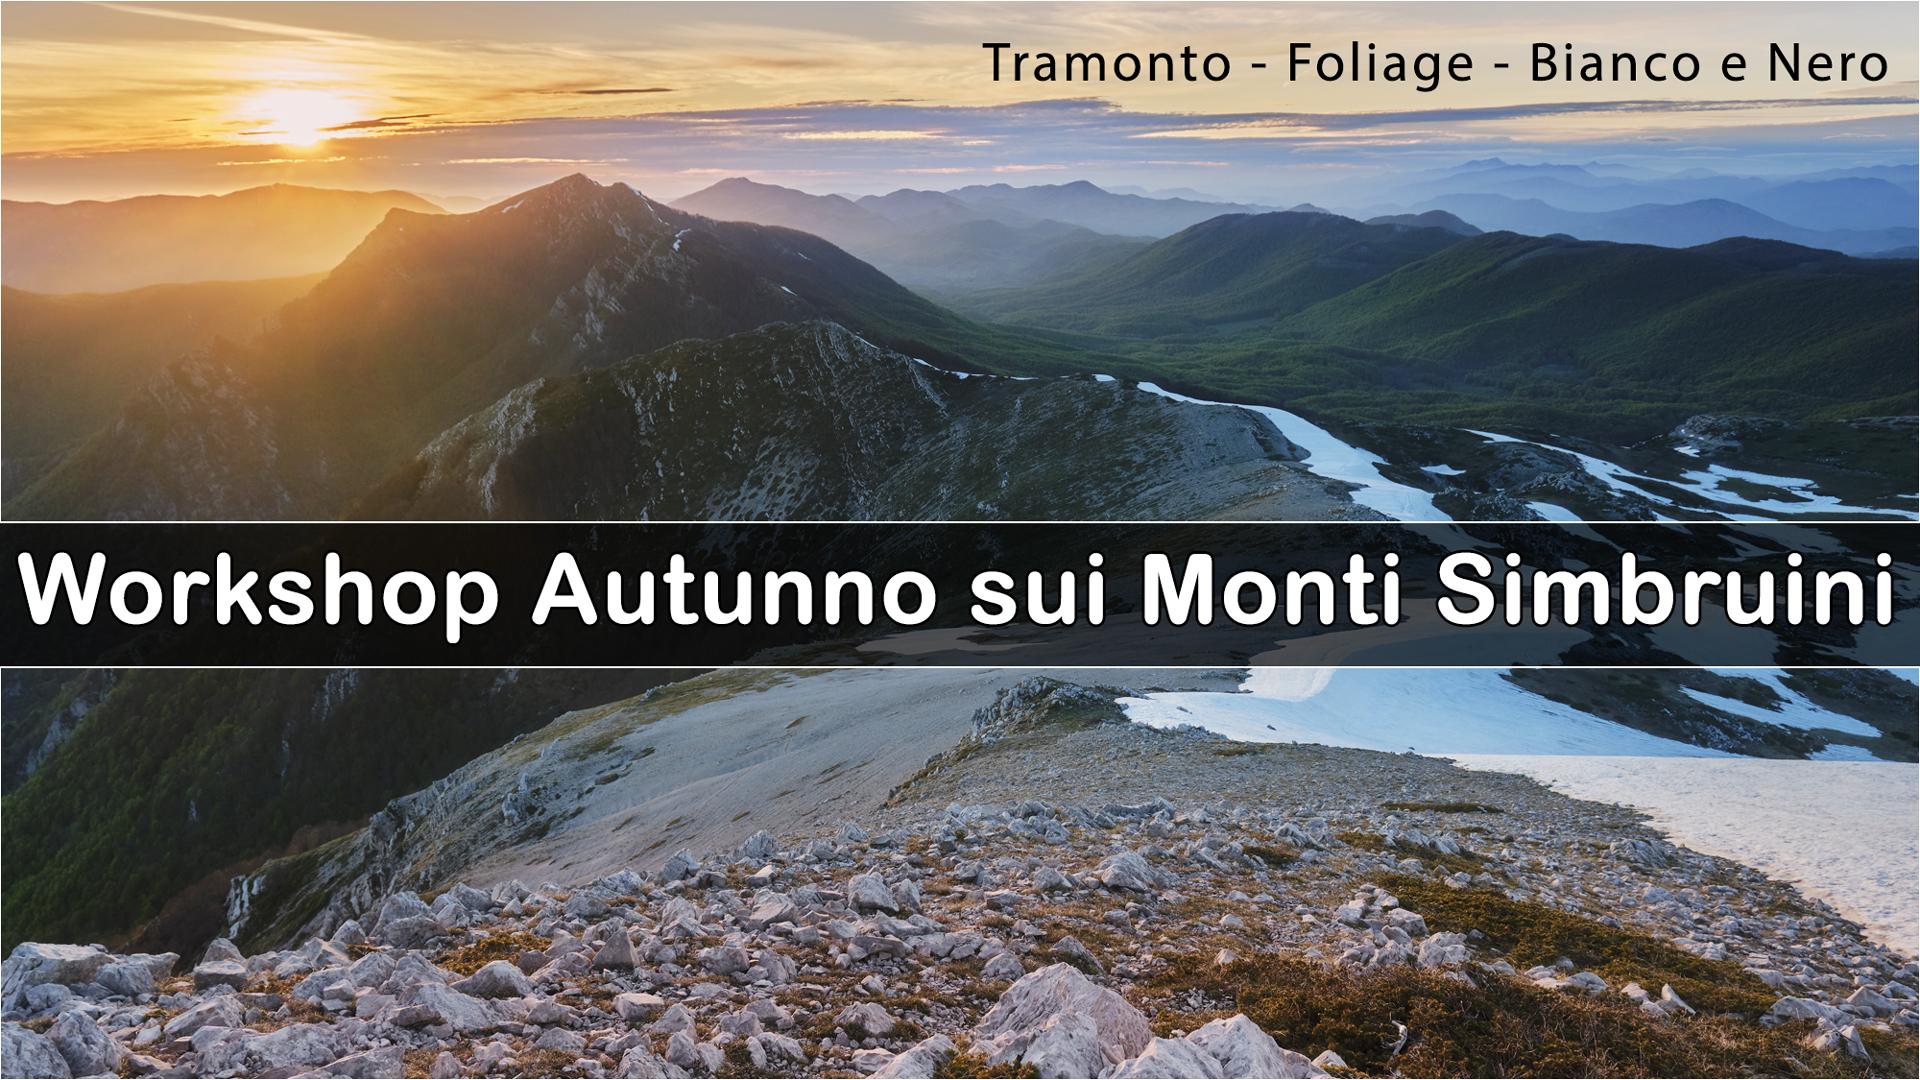 Workshop autunno sui Monti Simbruini 2021